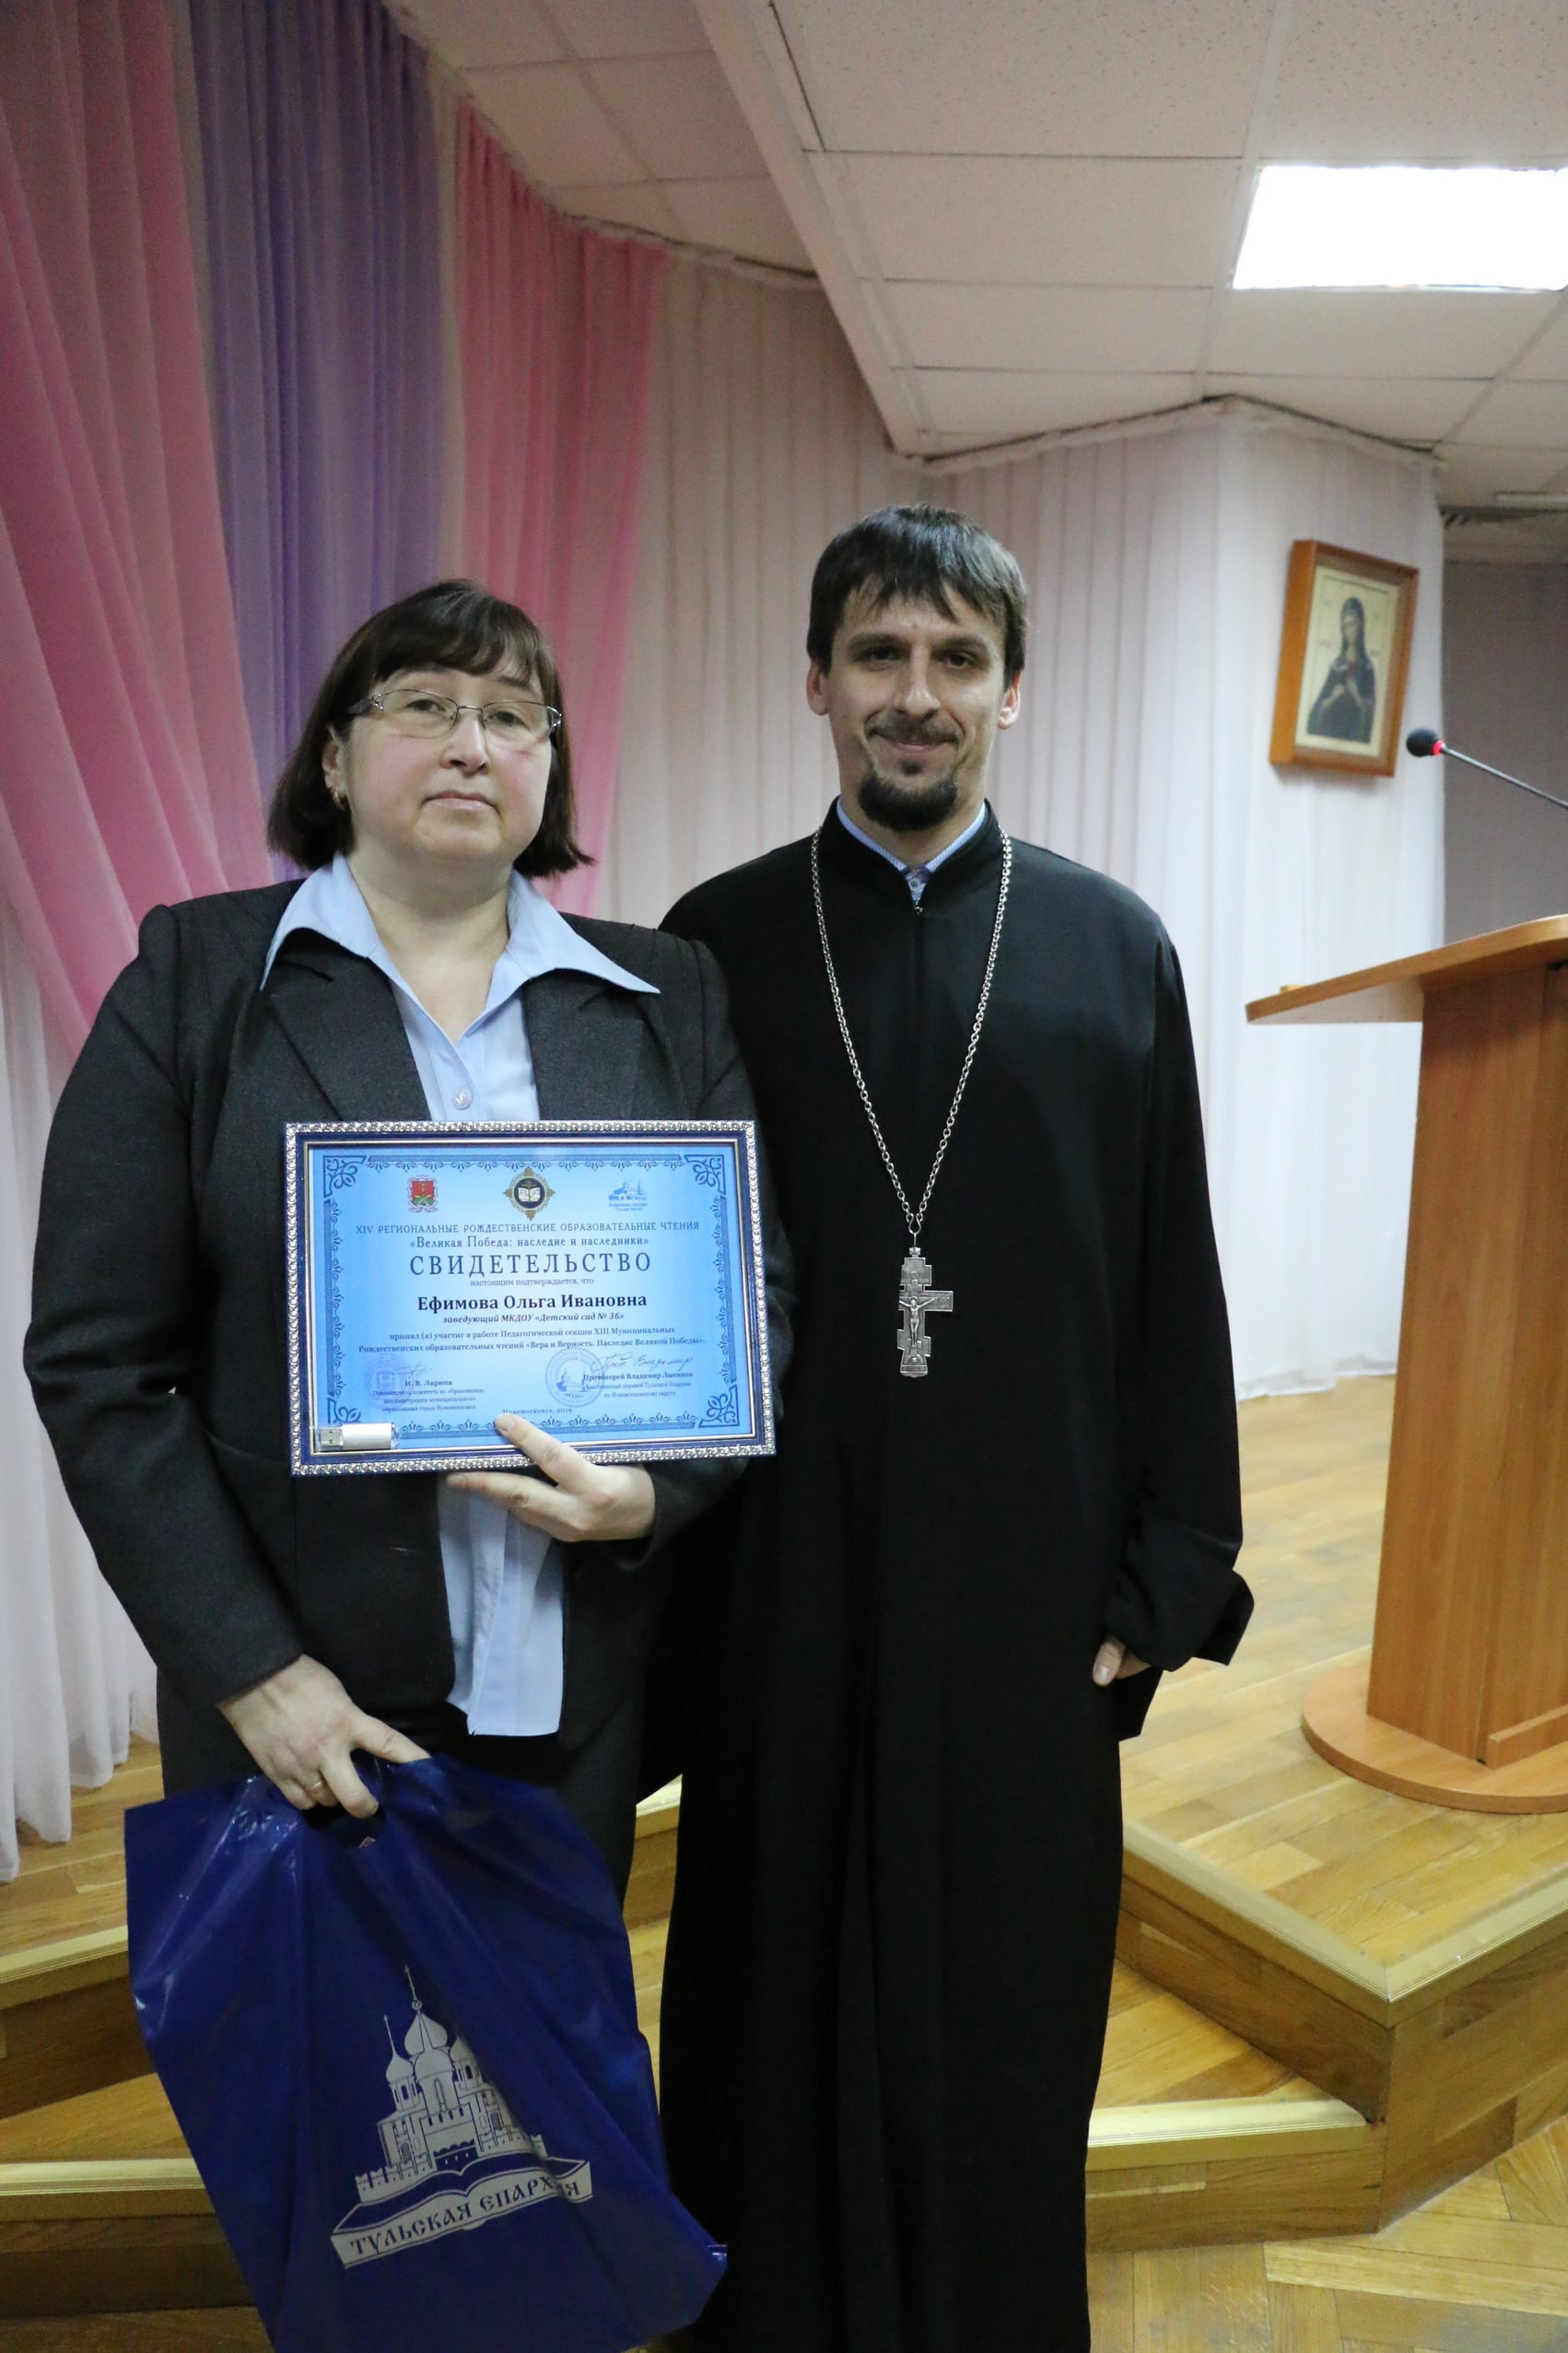 http://monuspen.ru/photoreports/06f1f0951a3799a9c804c7f0881a7695.JPG